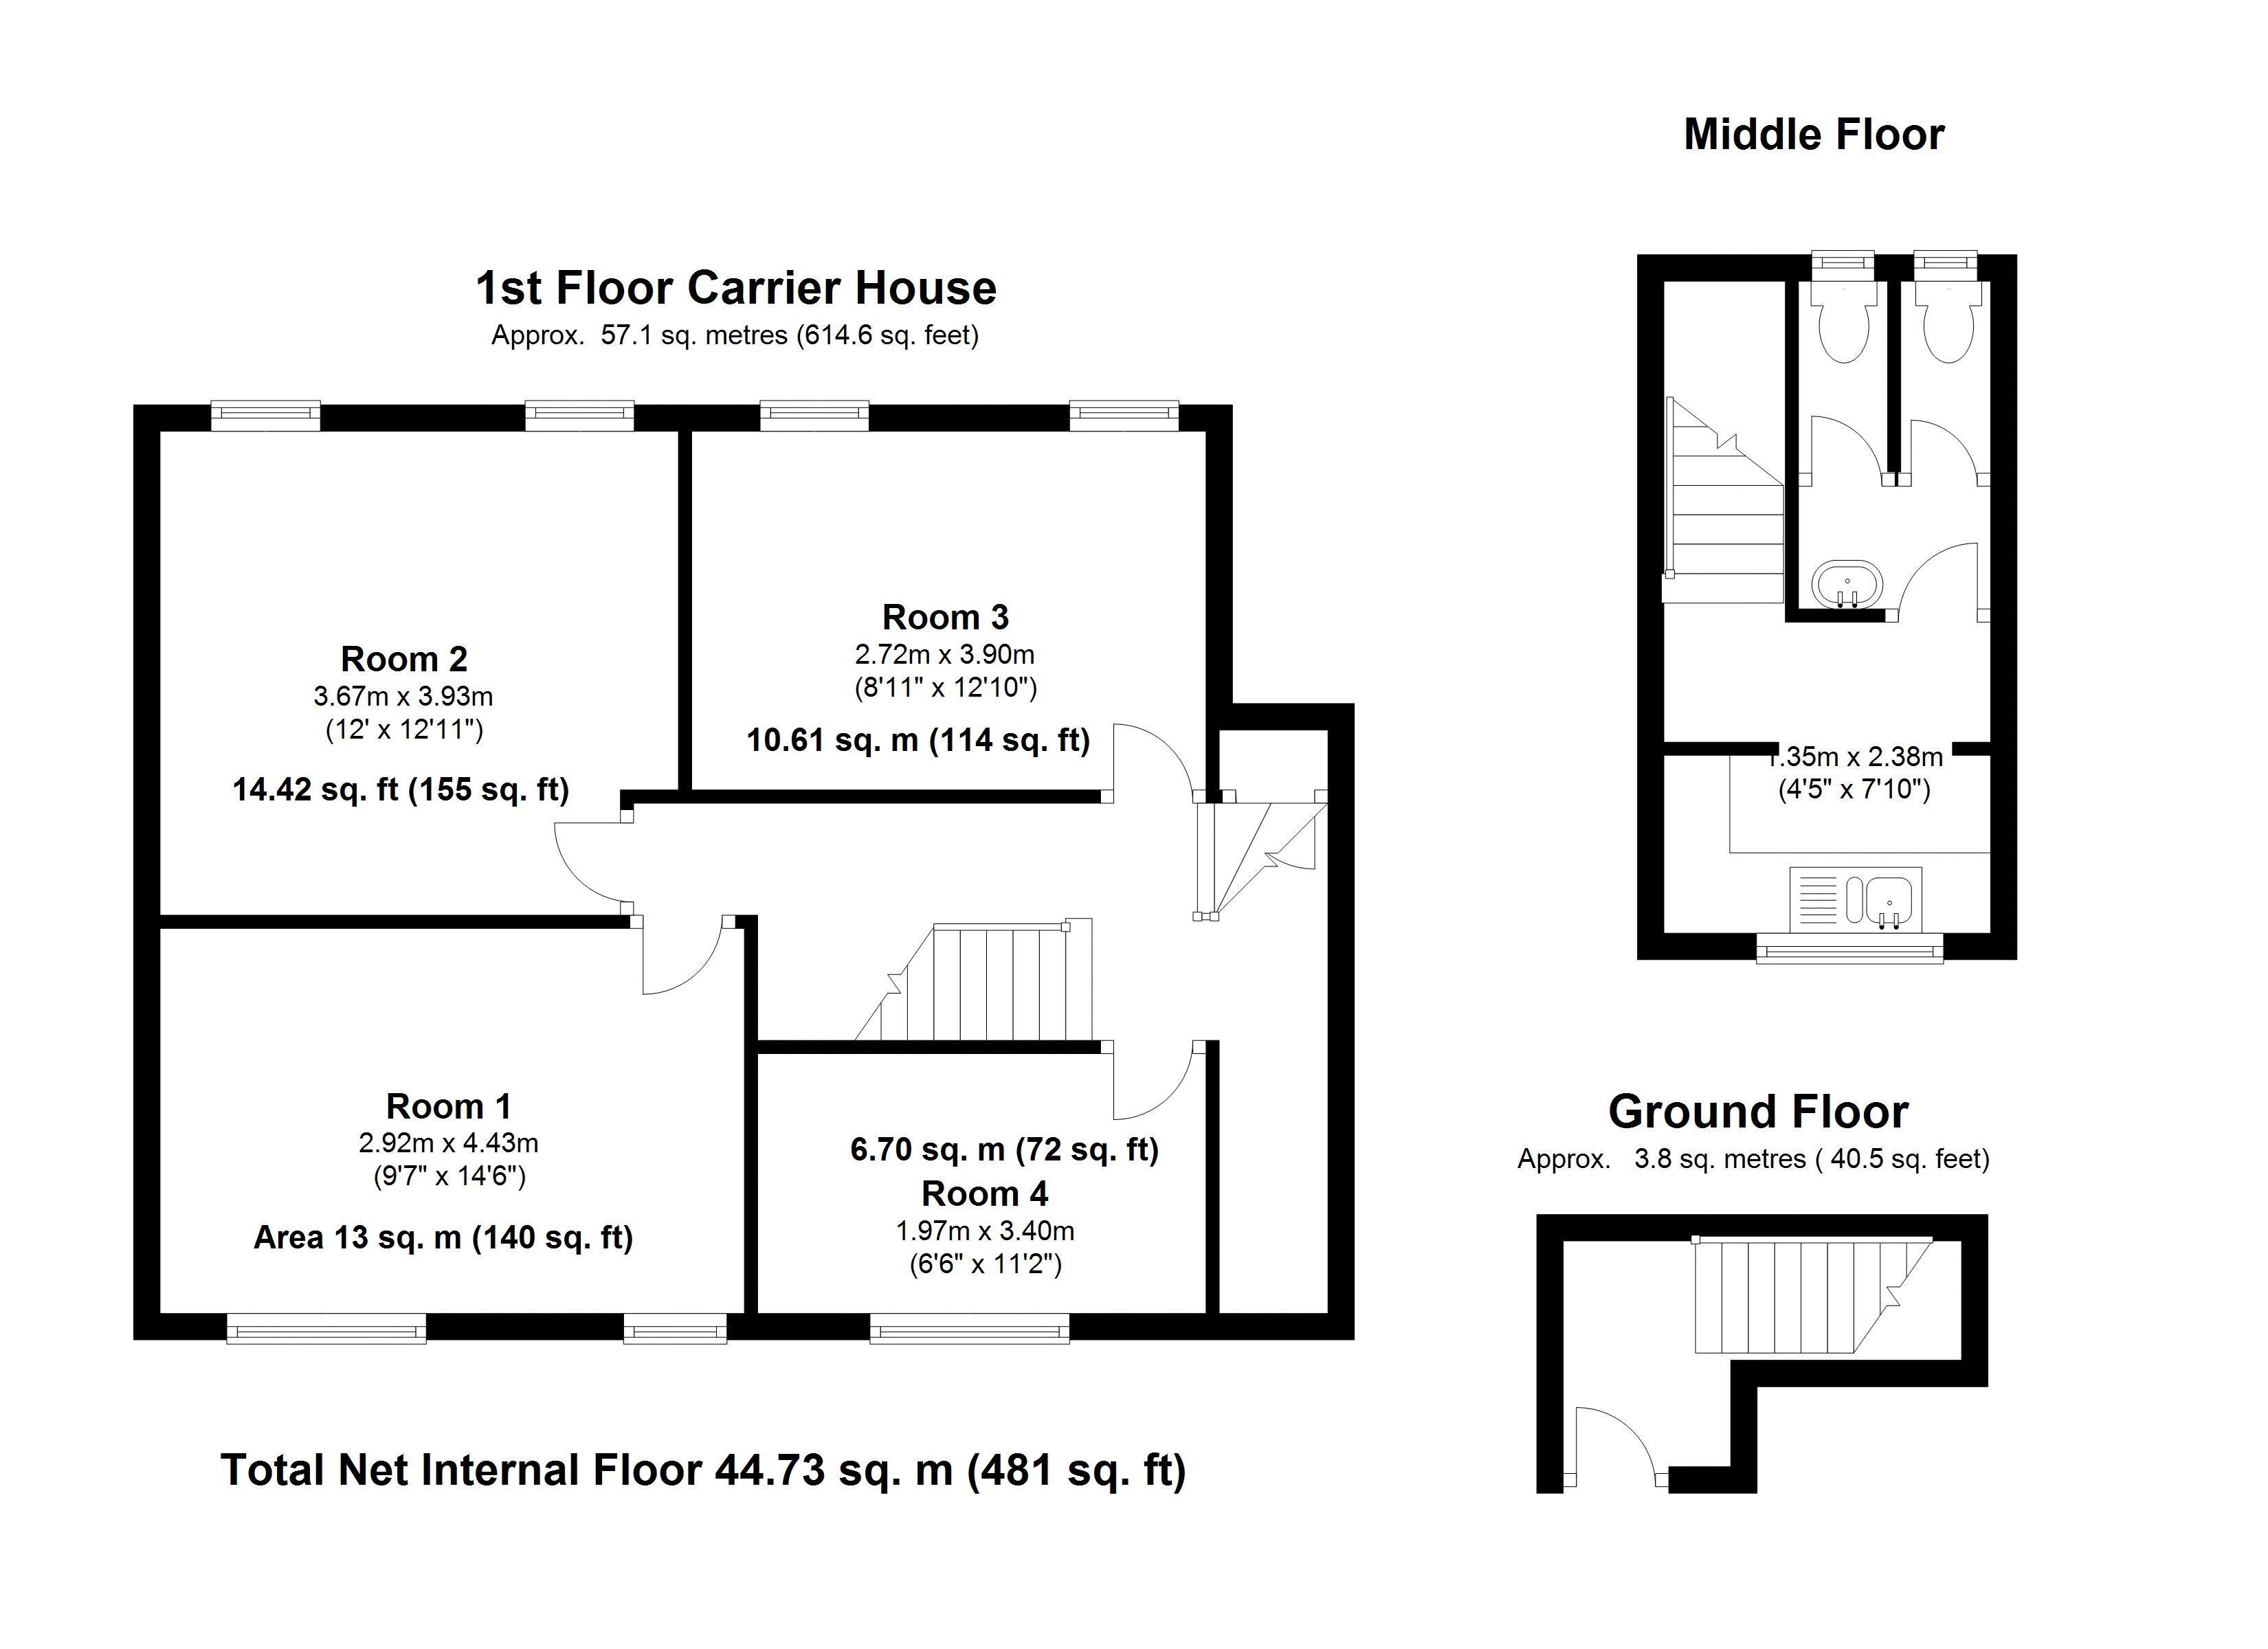 First Floor Carrier House - Floor Plan